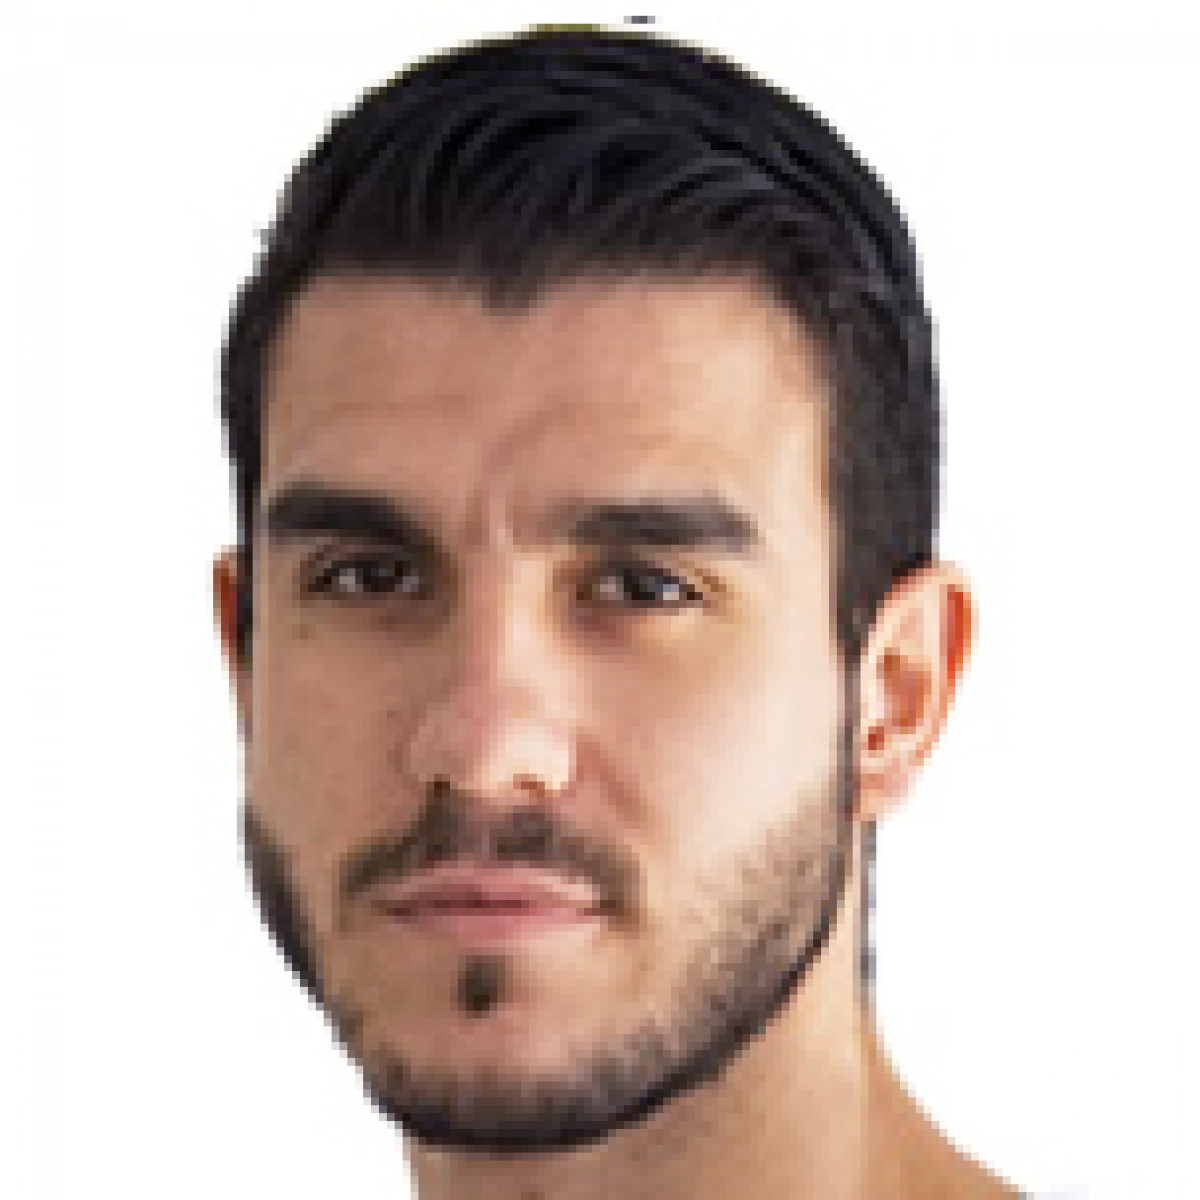 Sergio Rodriguez Febles